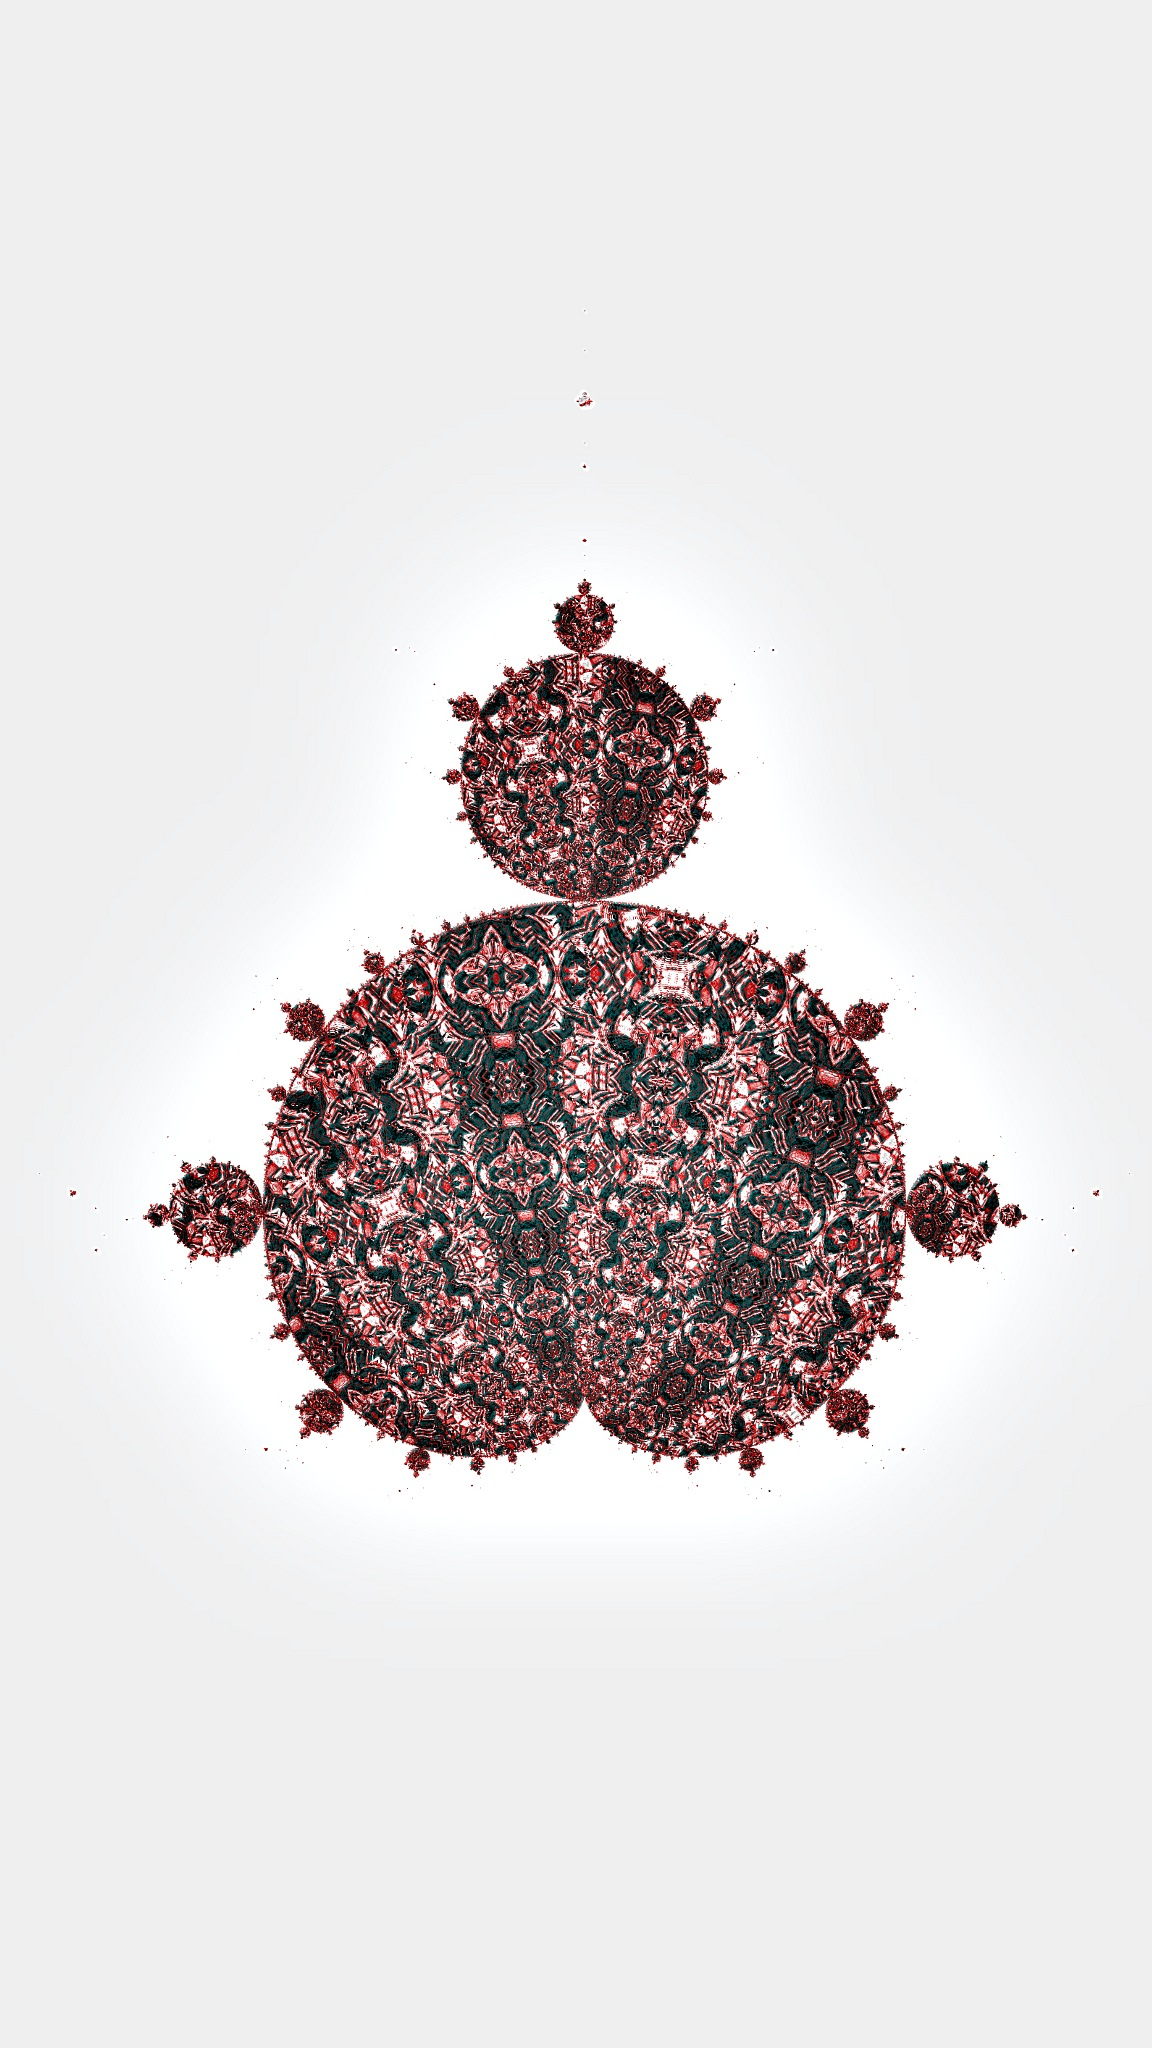 Mandelbrot by Florentin Bucataru